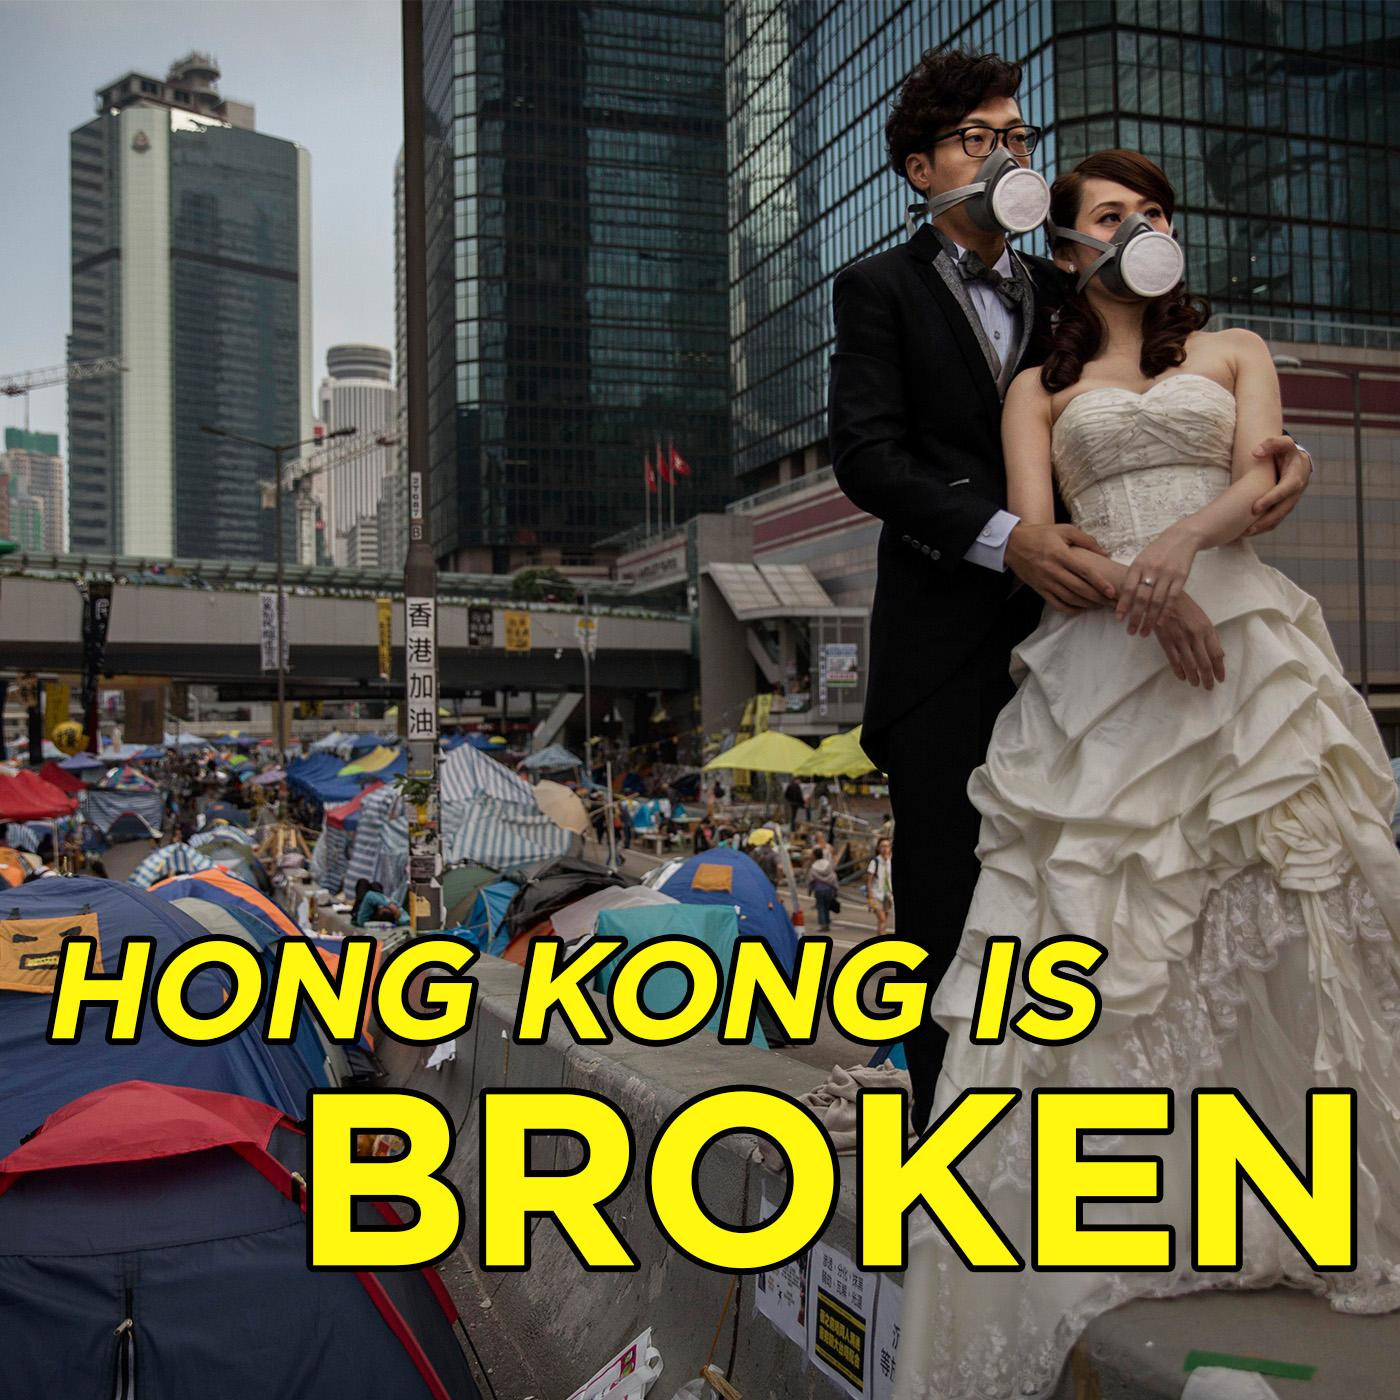 38 The System in Hong Kong is Broken | Antony Dapiran